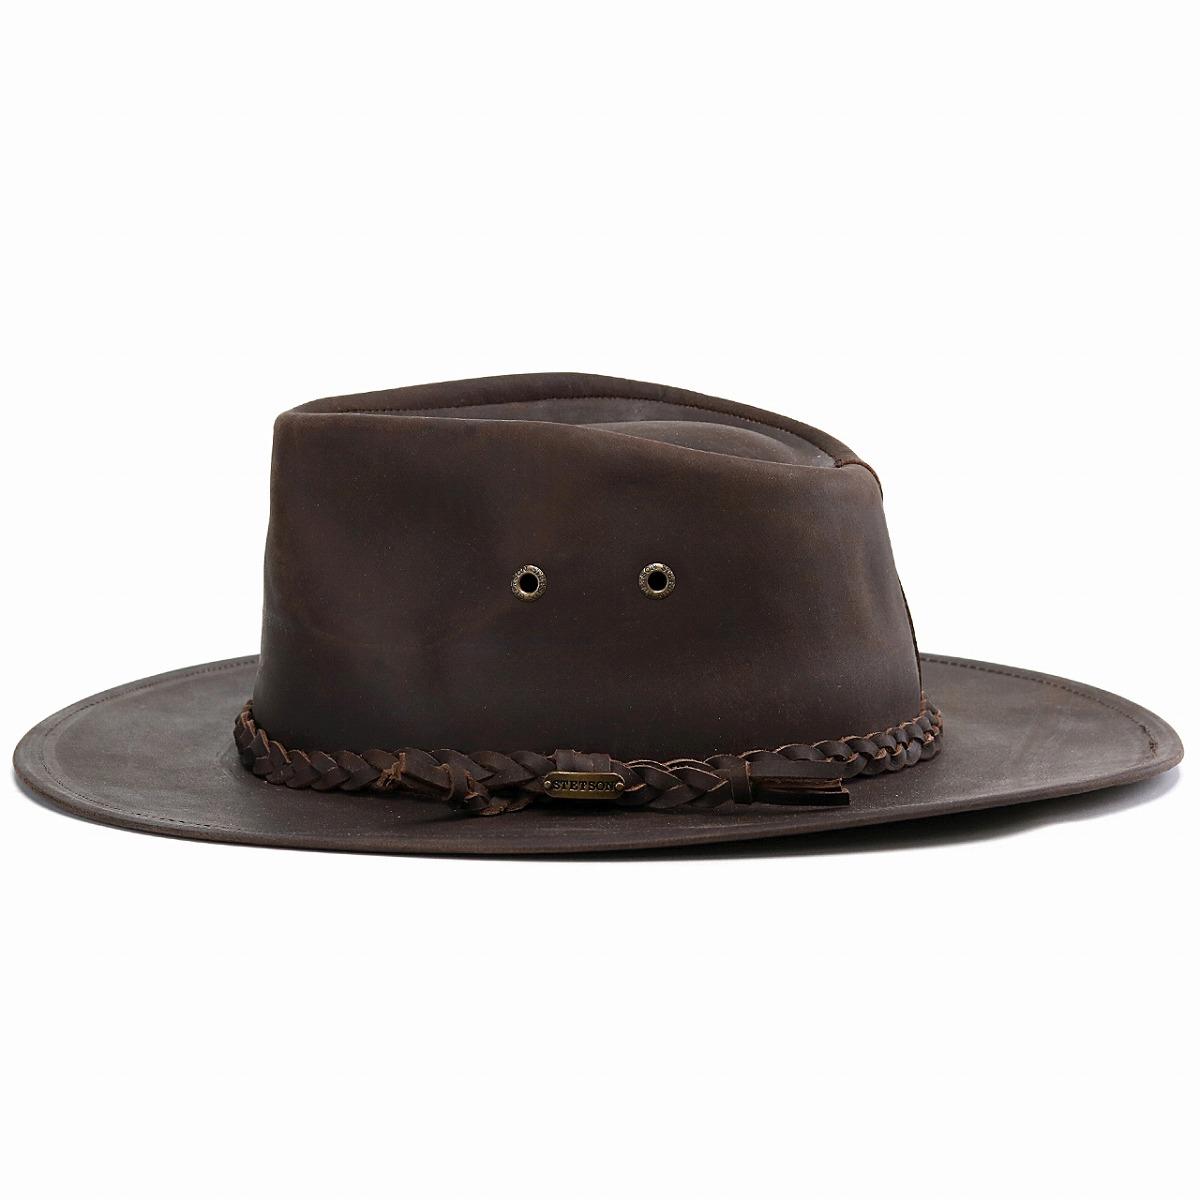 083f9e43 Mens Vintage Western Hats